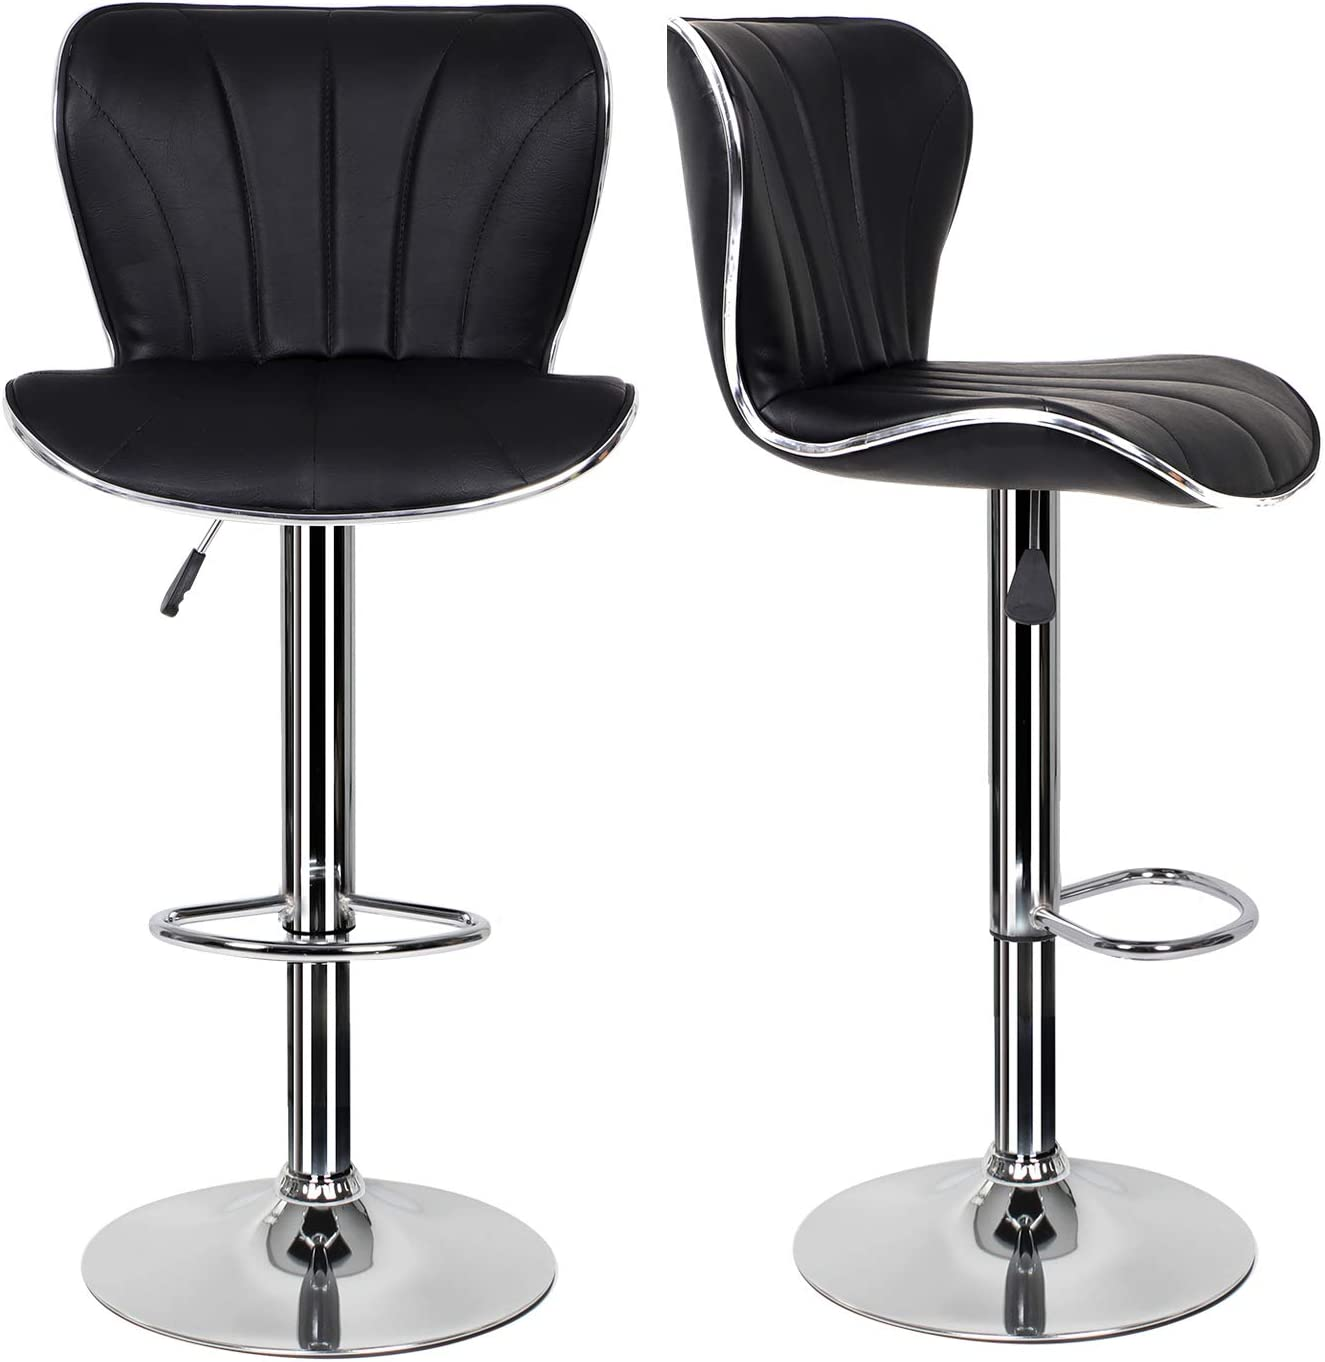 EUCO Pair of Black Bar Stools,Breakfast Bar Stool with Padded  Backrest&Chrome Footrest Swivel Gas Lift Elegant Leather Bar Stool for  Kitchen/Breakfast ...